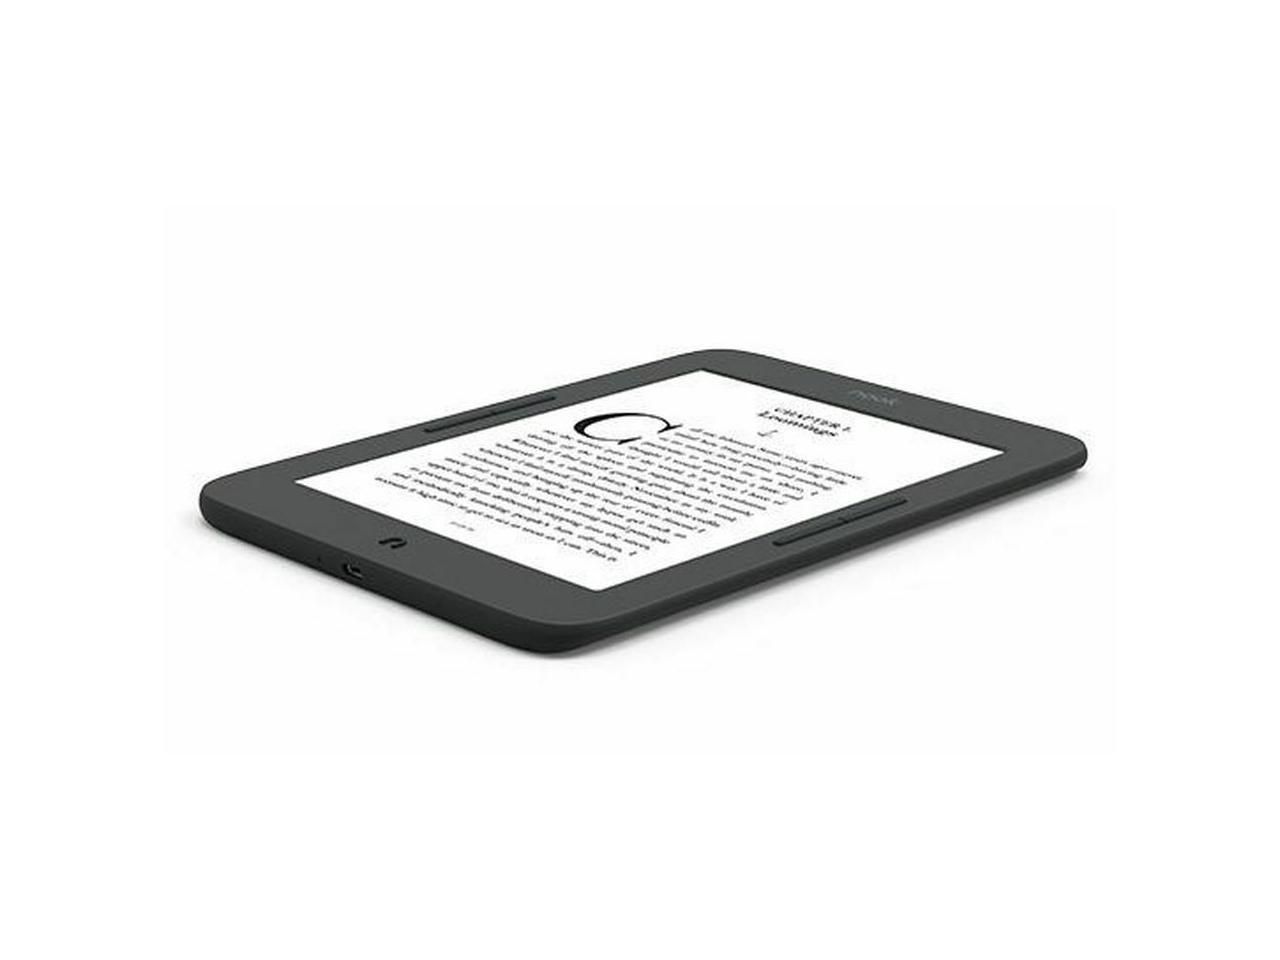 BNRV700 Barnes /& Noble Nook GlowLight Plus 7.8 eReader